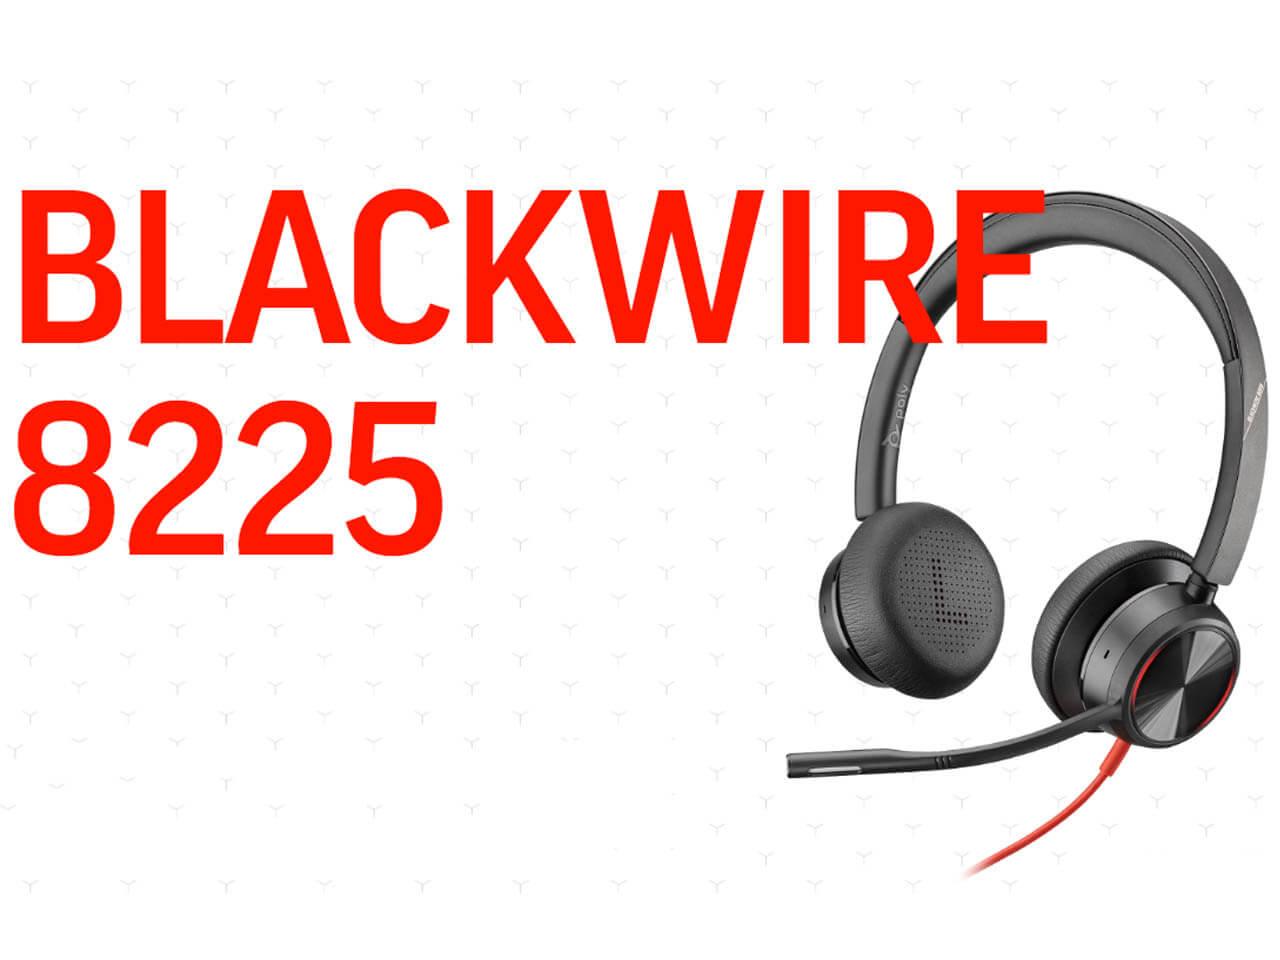 Blackwire